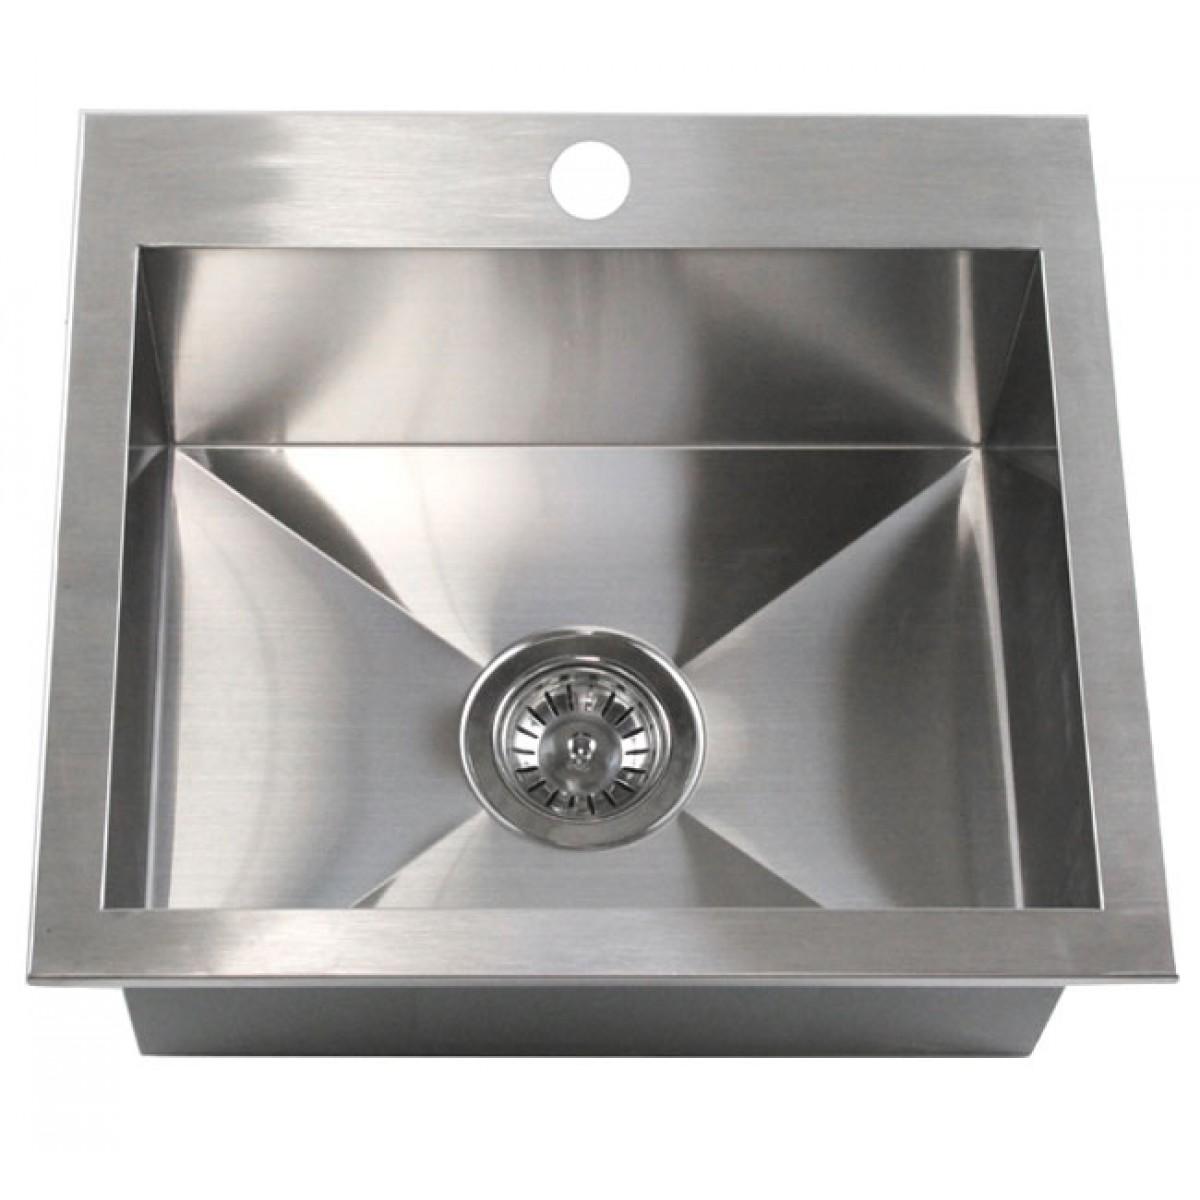 19 inch top mount drop in stainless steel single bowl kitchen island bar sink zero radius design